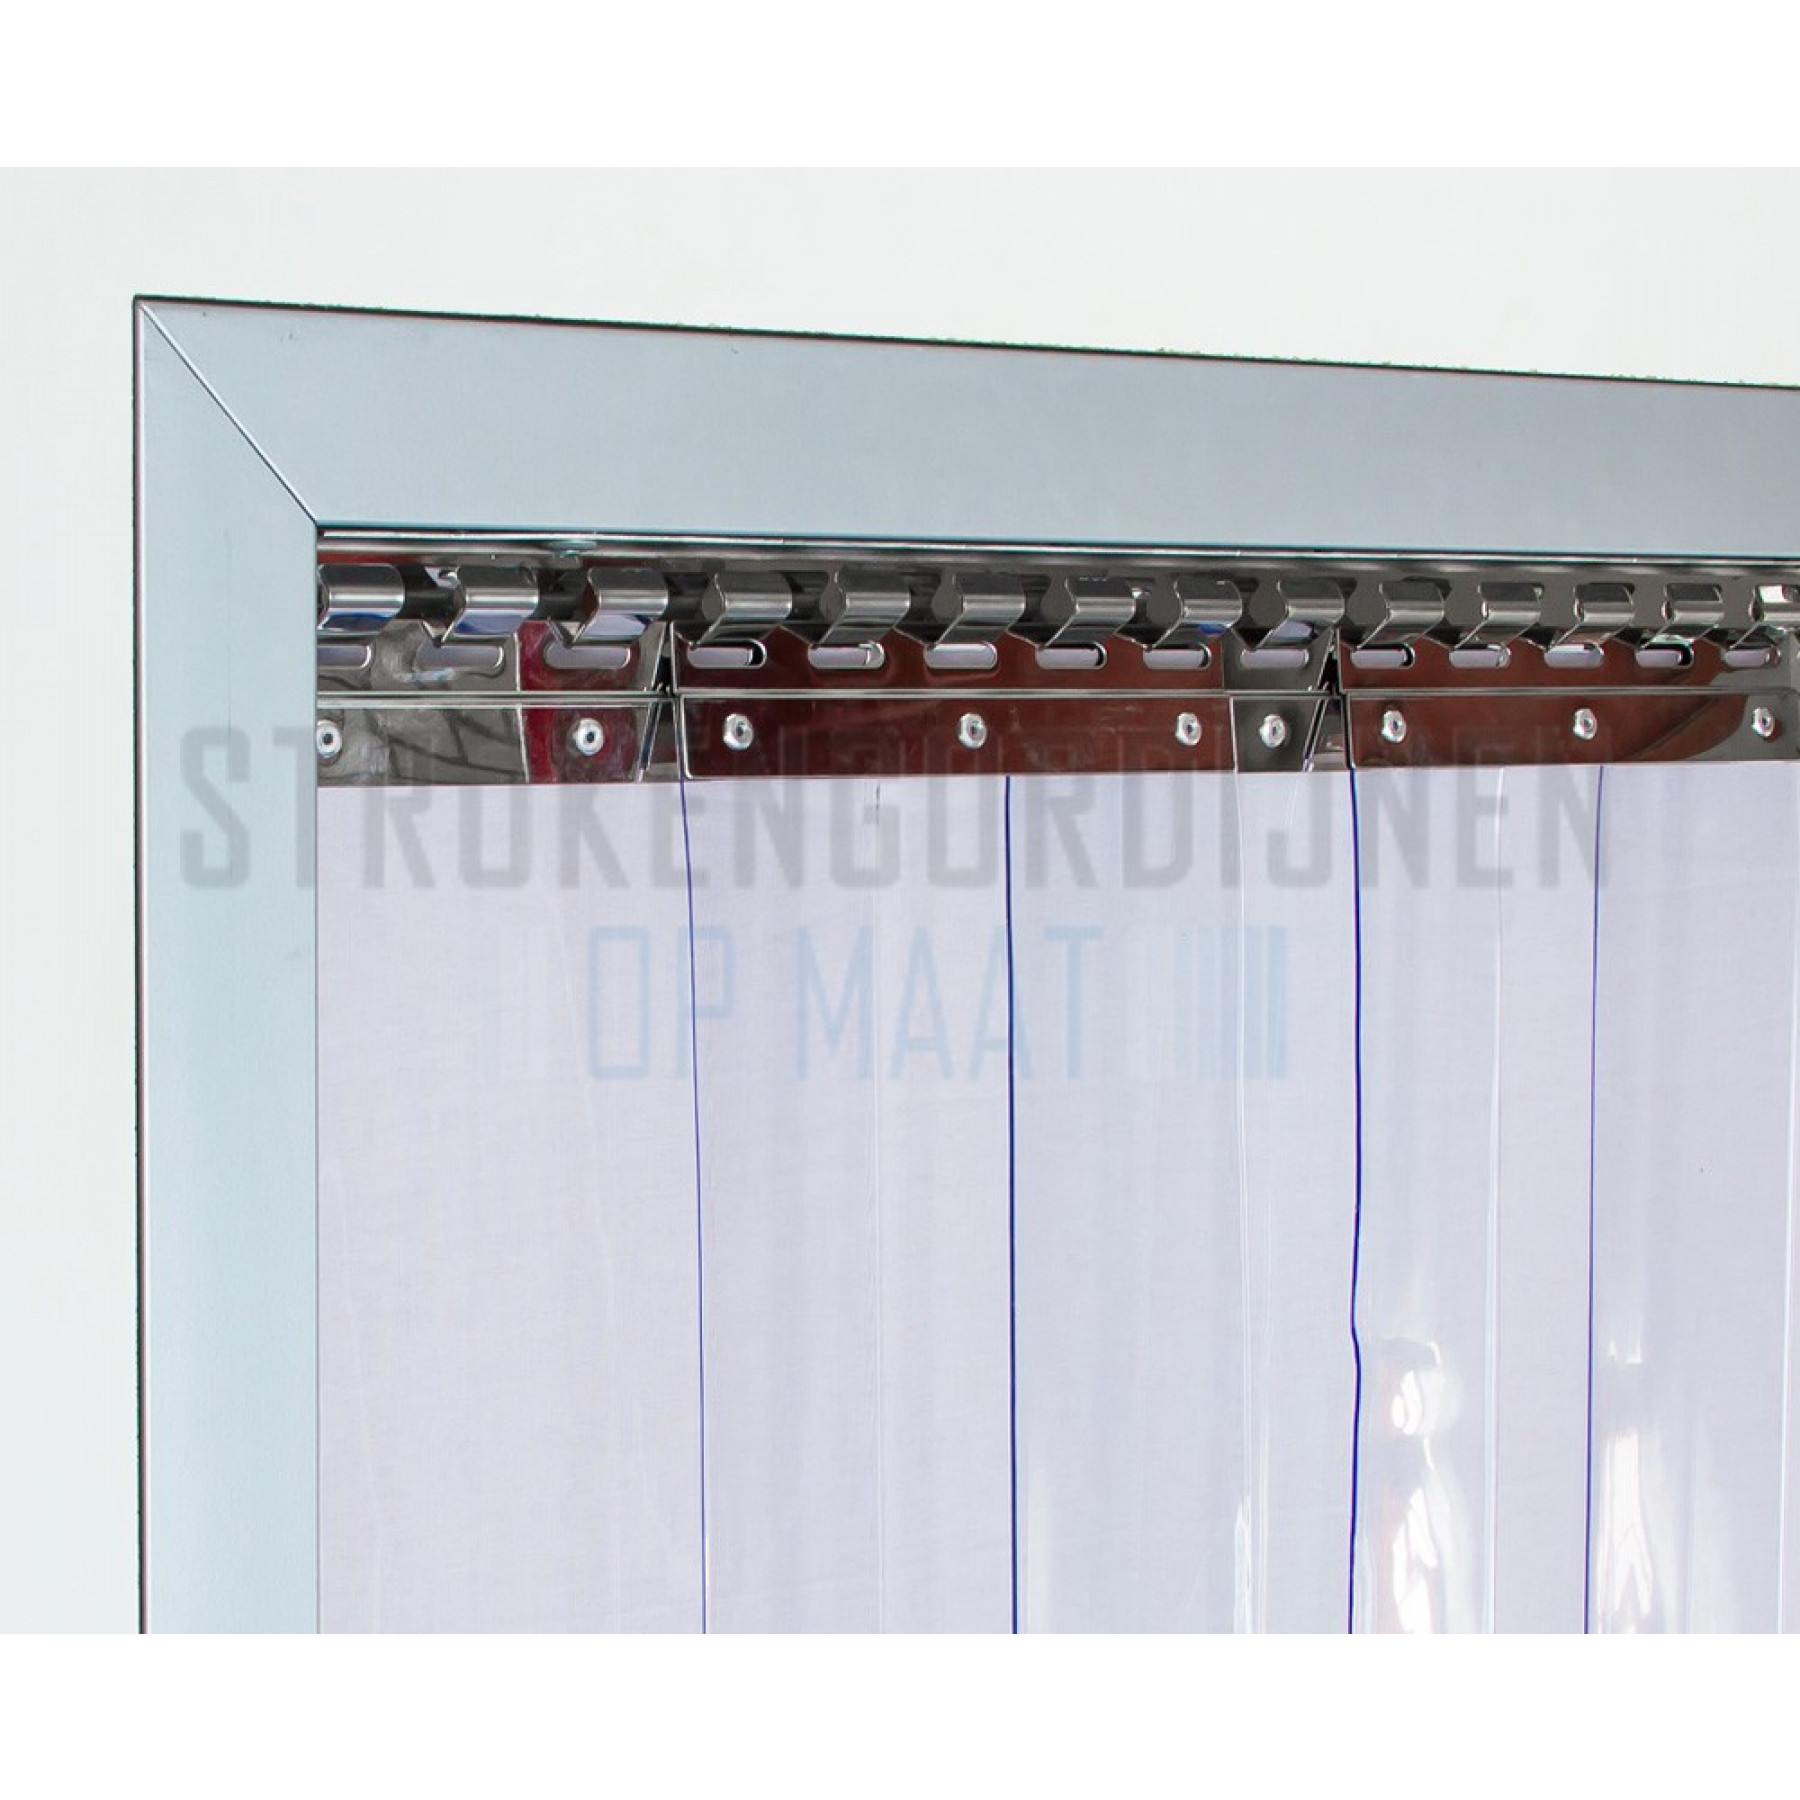 pvc rolle 200mm breit 2mm dick 50 meter lang transparent in pvc streifen. Black Bedroom Furniture Sets. Home Design Ideas